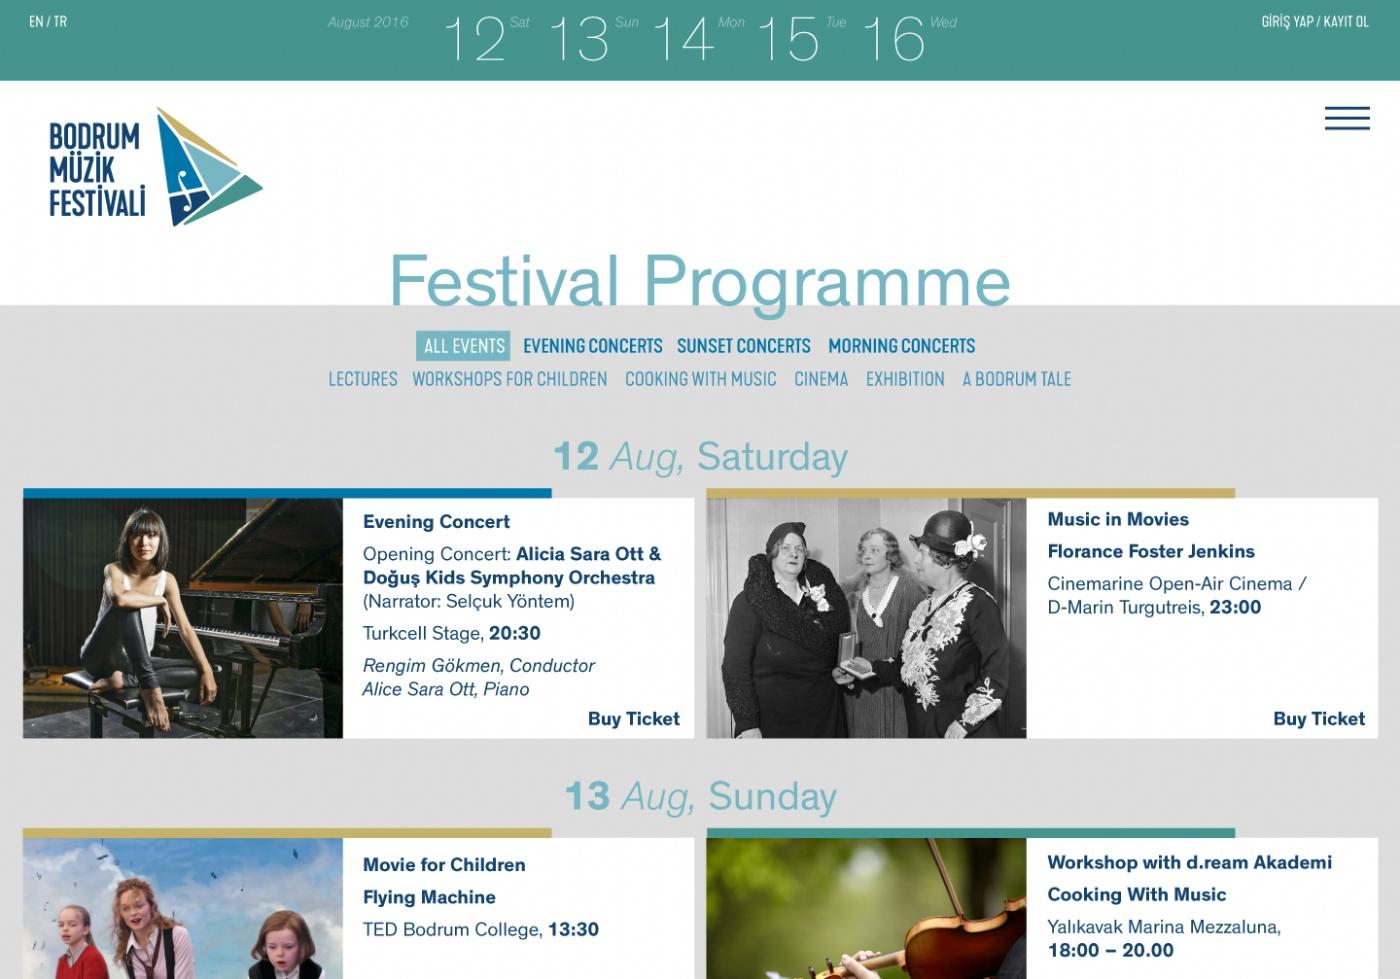 Bodrum Music Festival - MONROE | CREATIVE STUDIO